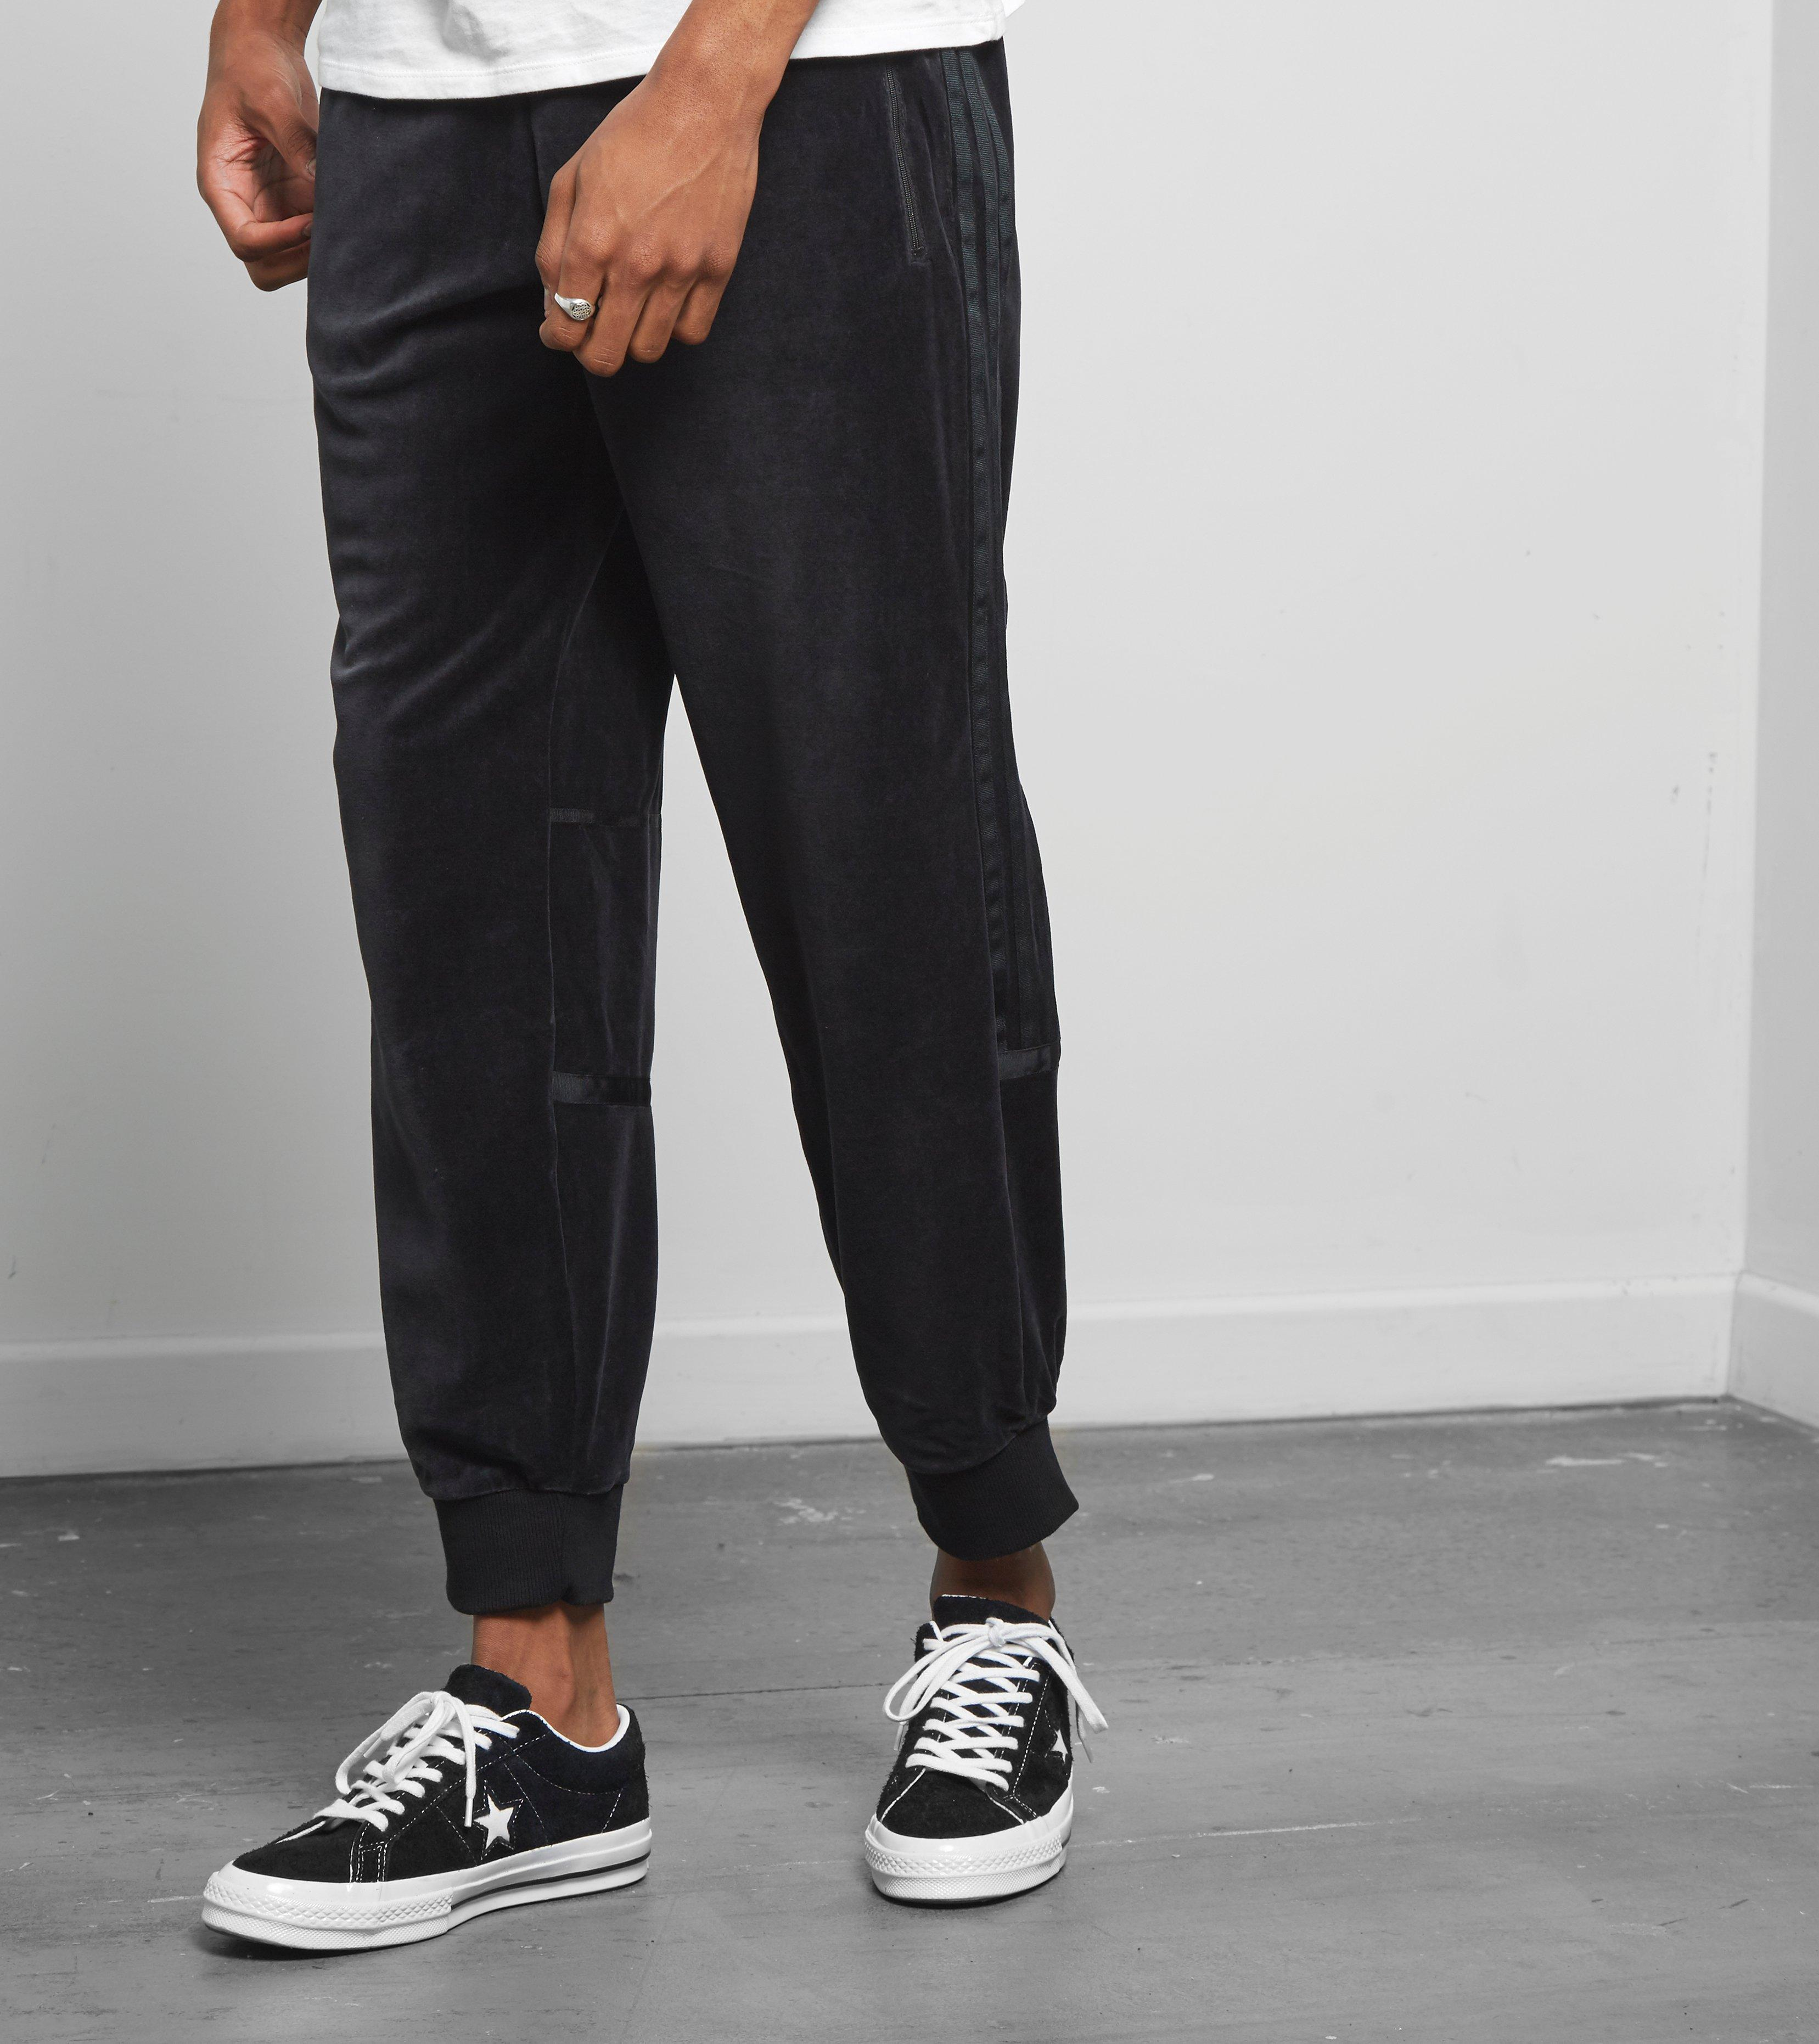 adidas challenger track pants velour